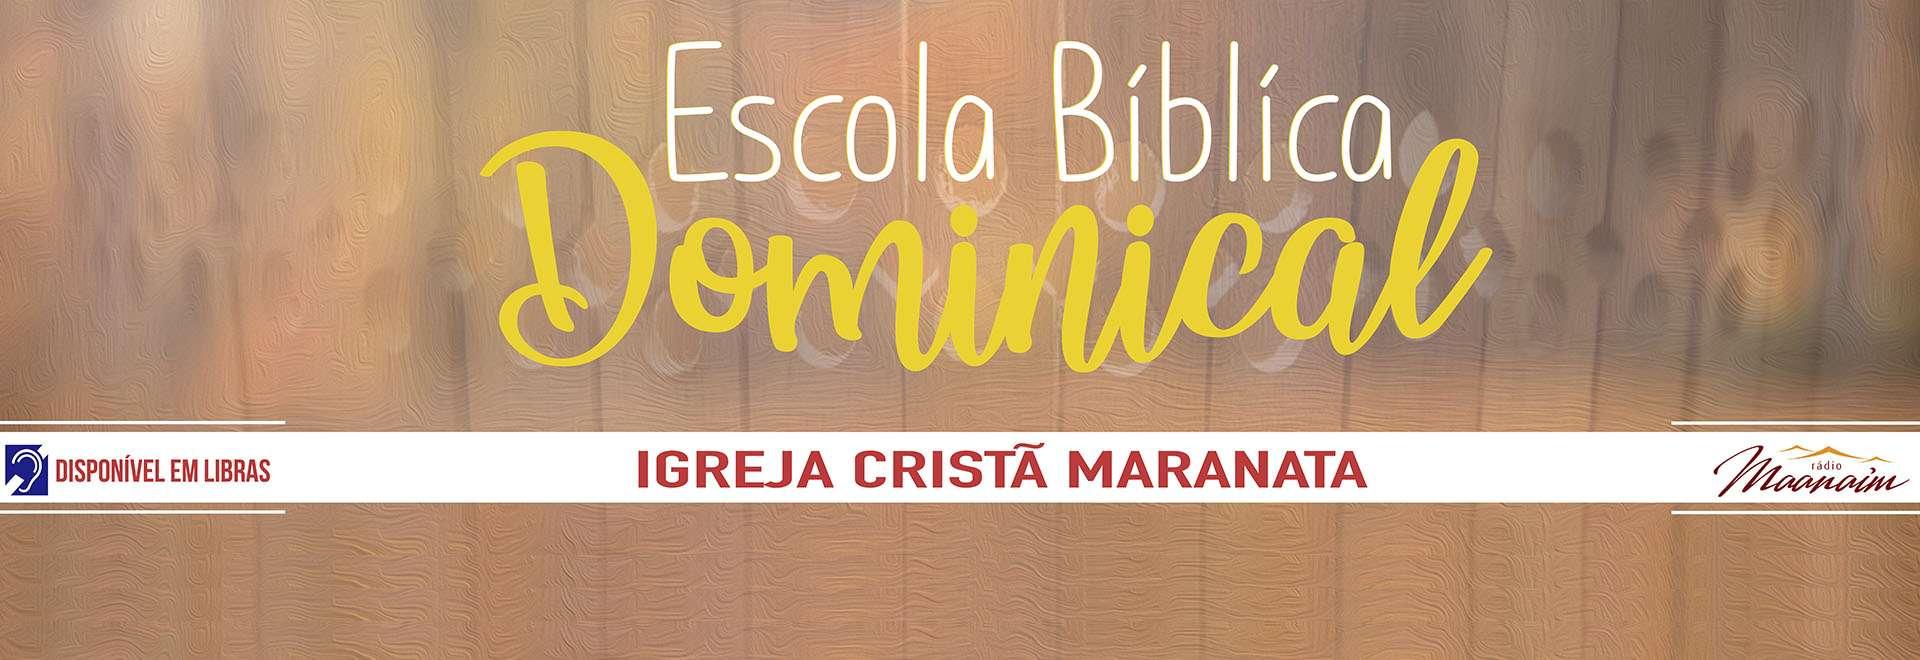 Participações da EBD da Igreja Cristã Maranata - 21/02/2021